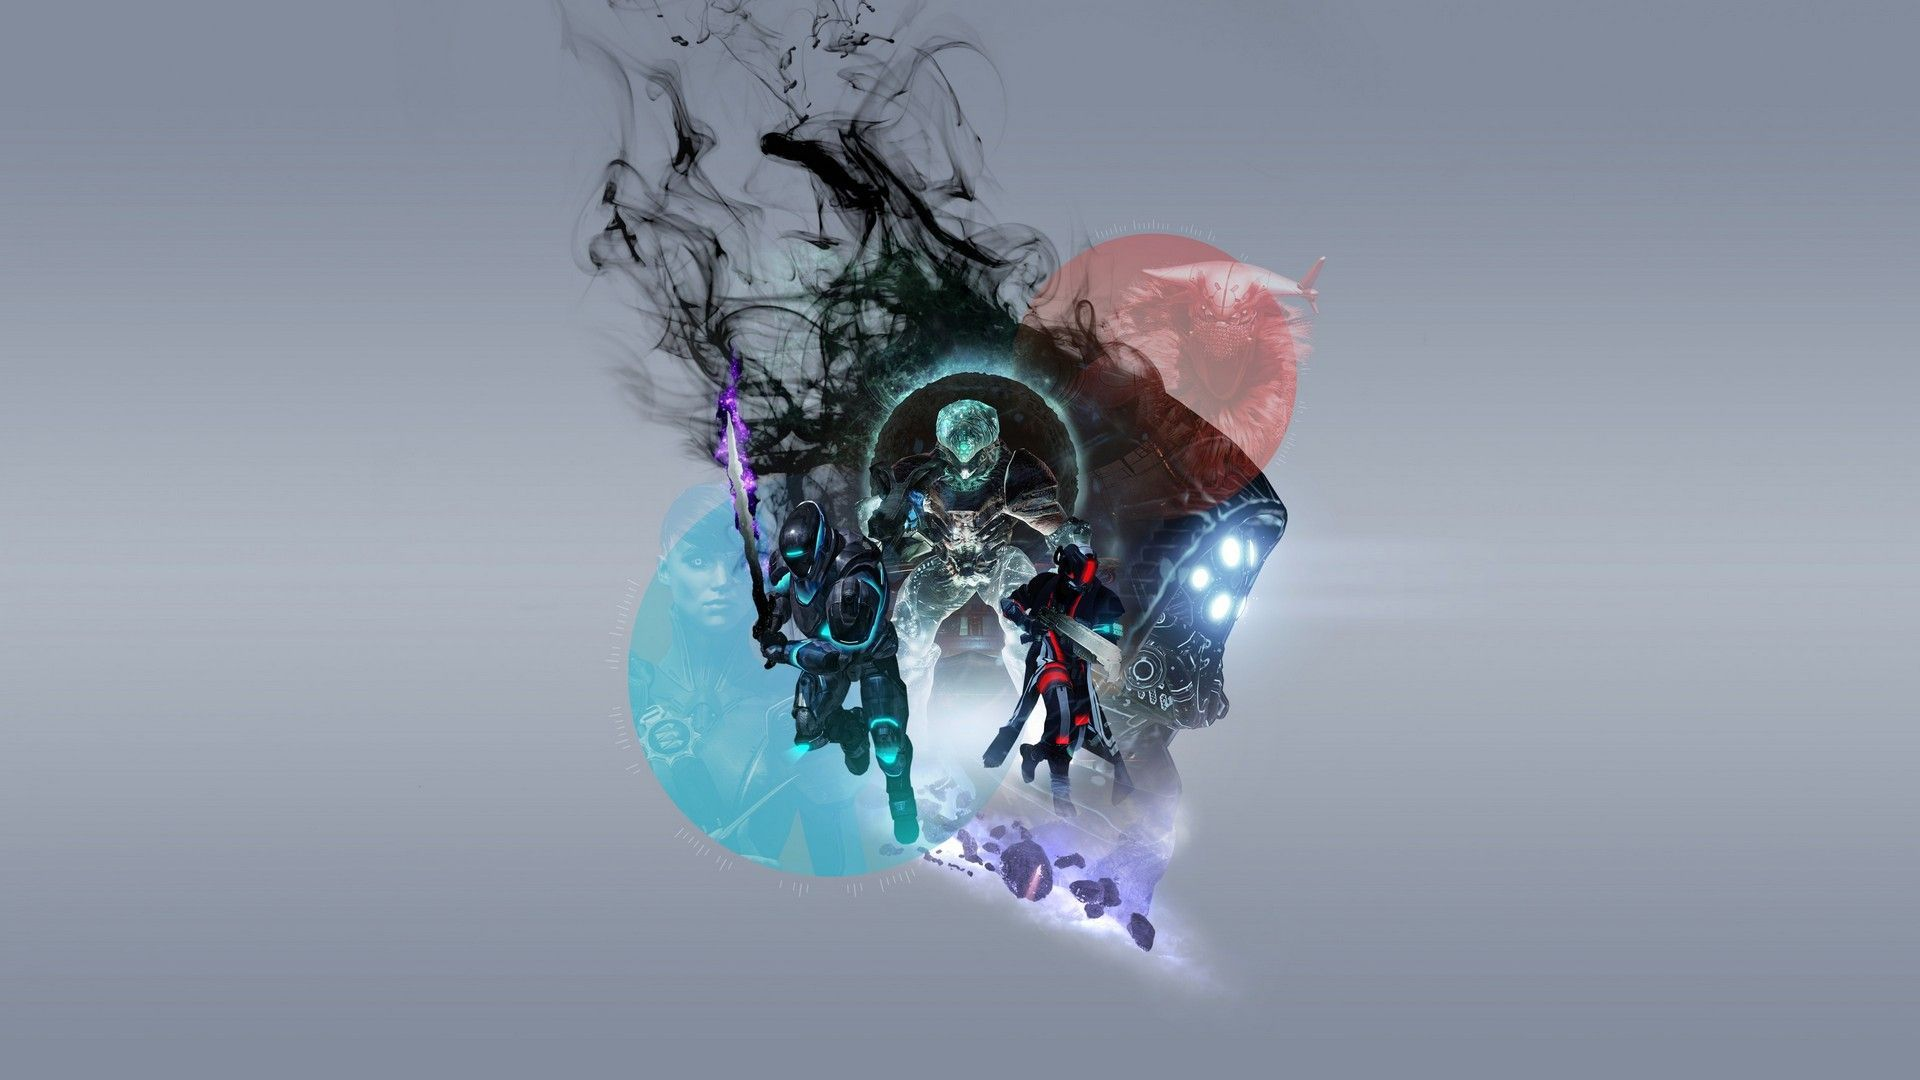 Destiny 2 Shadowkeep Wallpaper In 2020 Art Wallpaper Uhd Wallpaper Concept Art